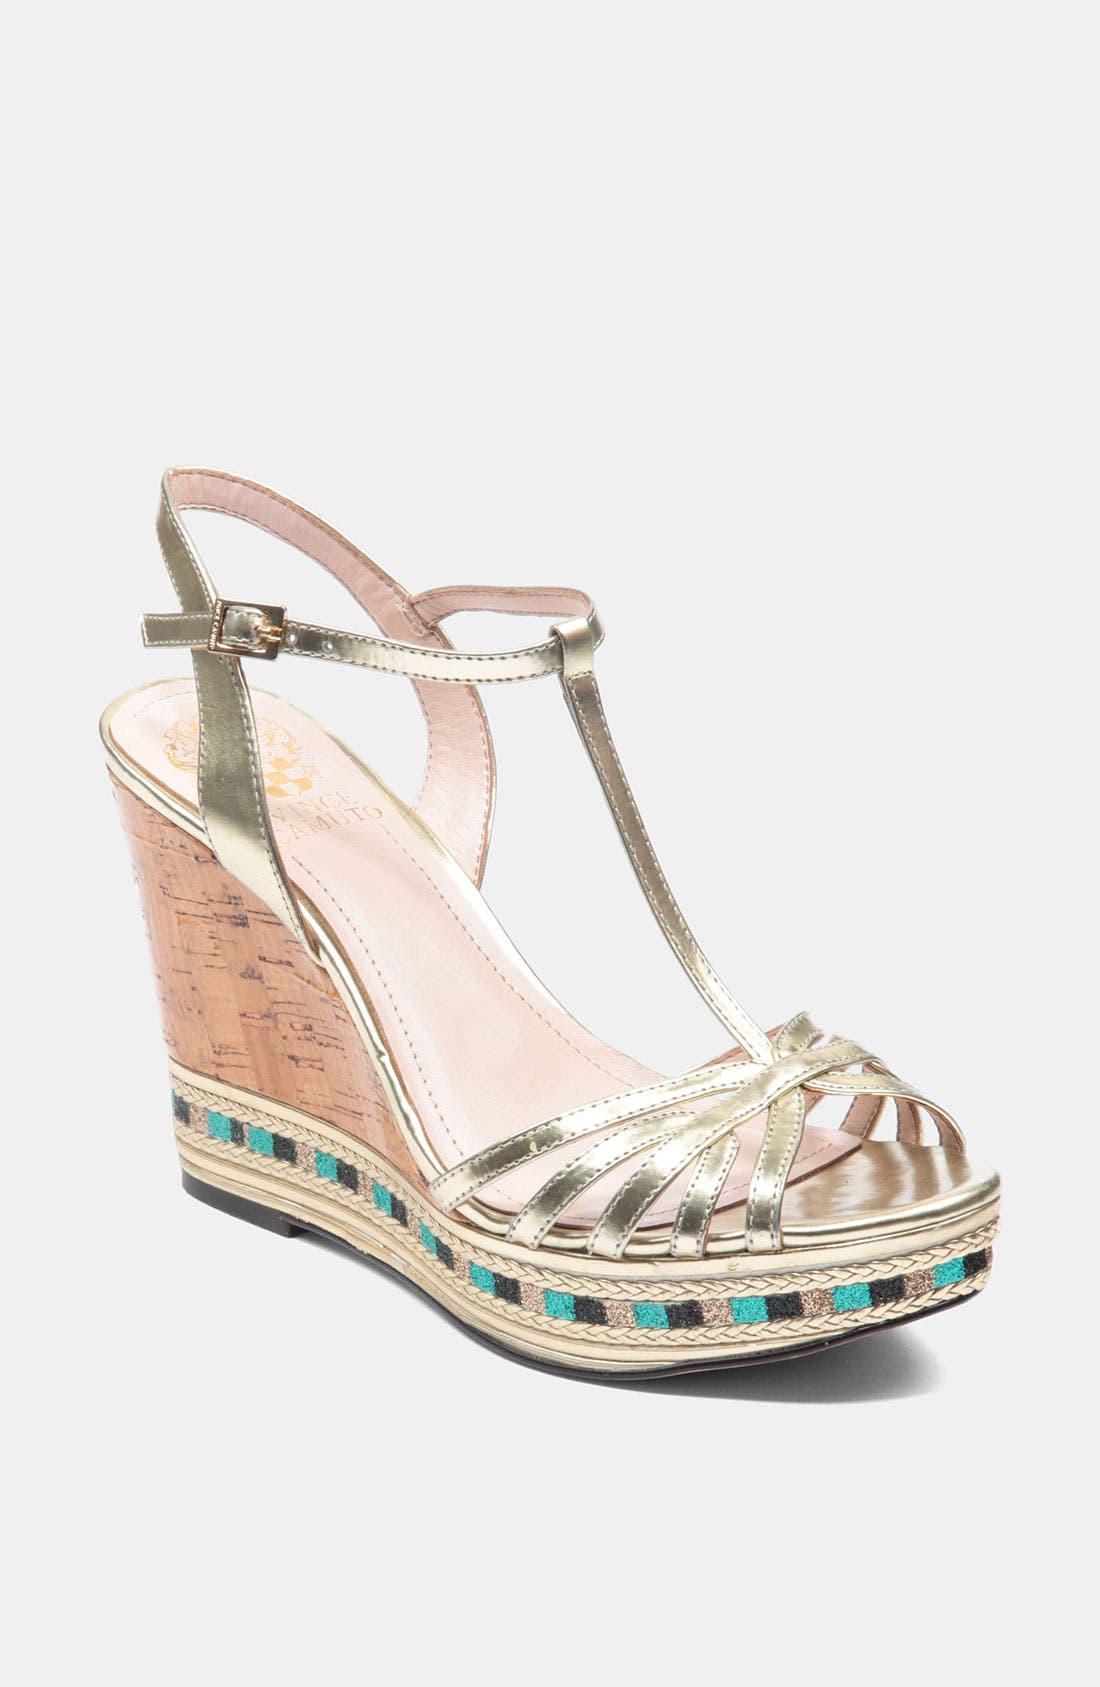 Main Image - Vince Camuto 'Tasha' Sandal